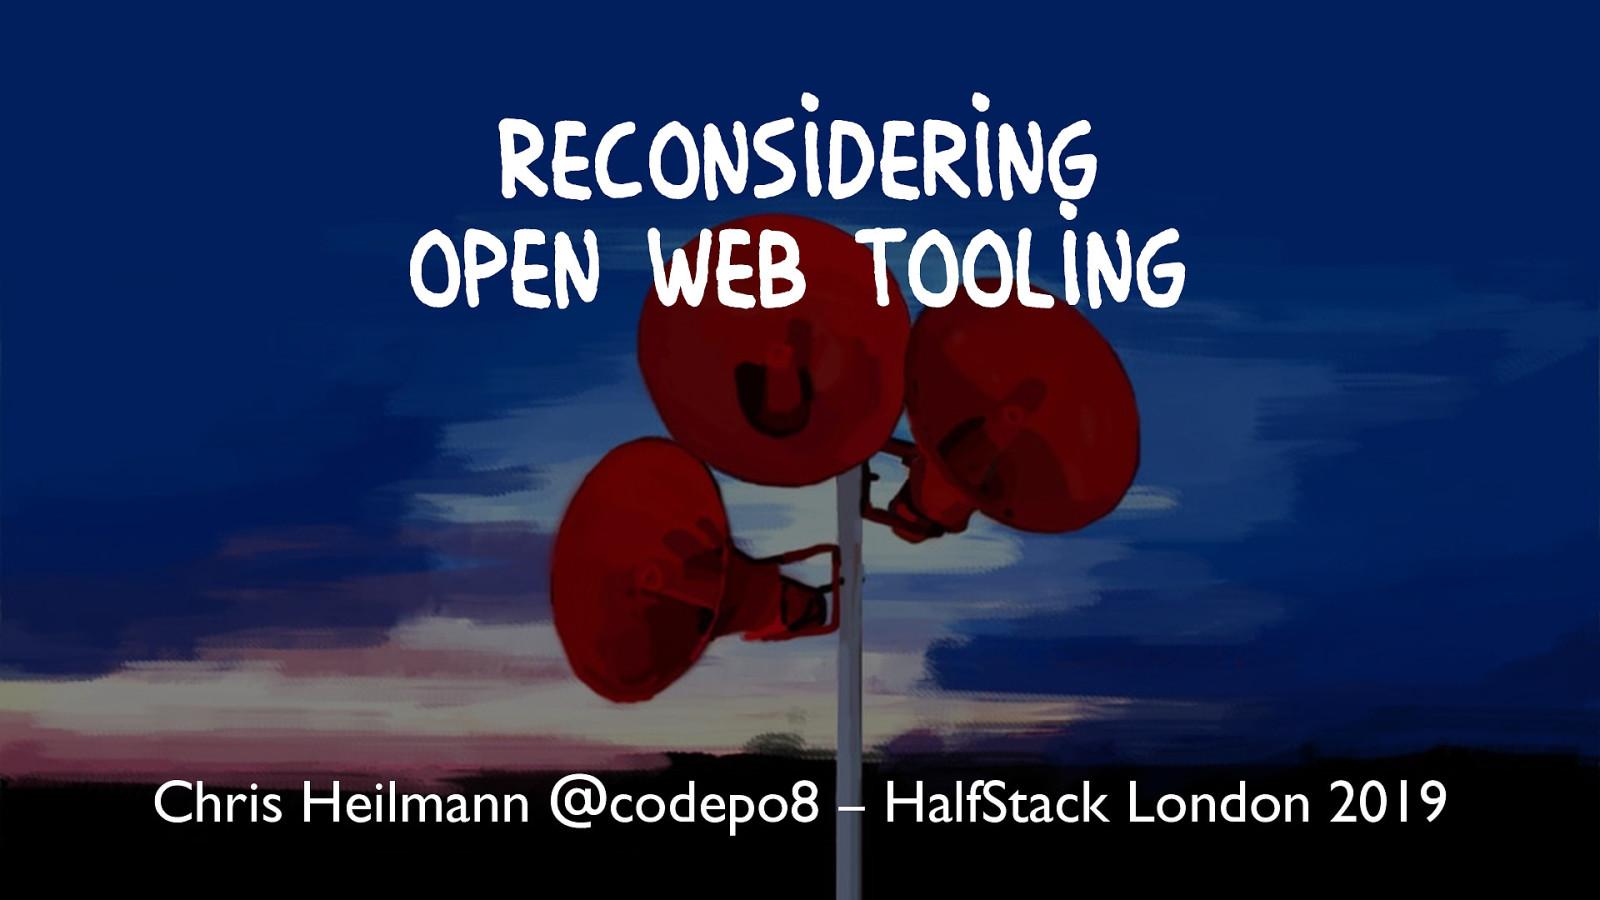 Reconsideringopen web tooling